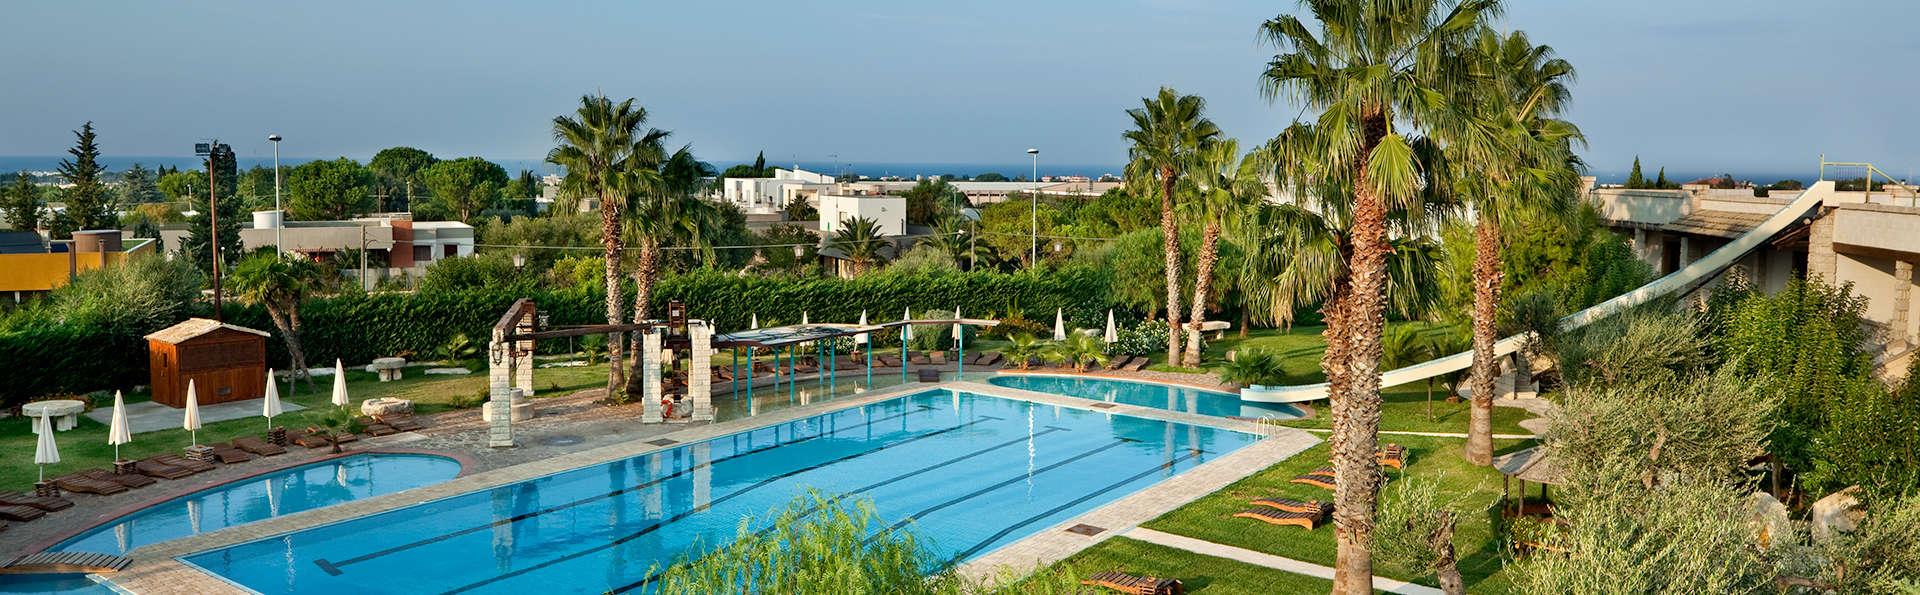 Unahotels Regina Bari - edit_pool43.jpg